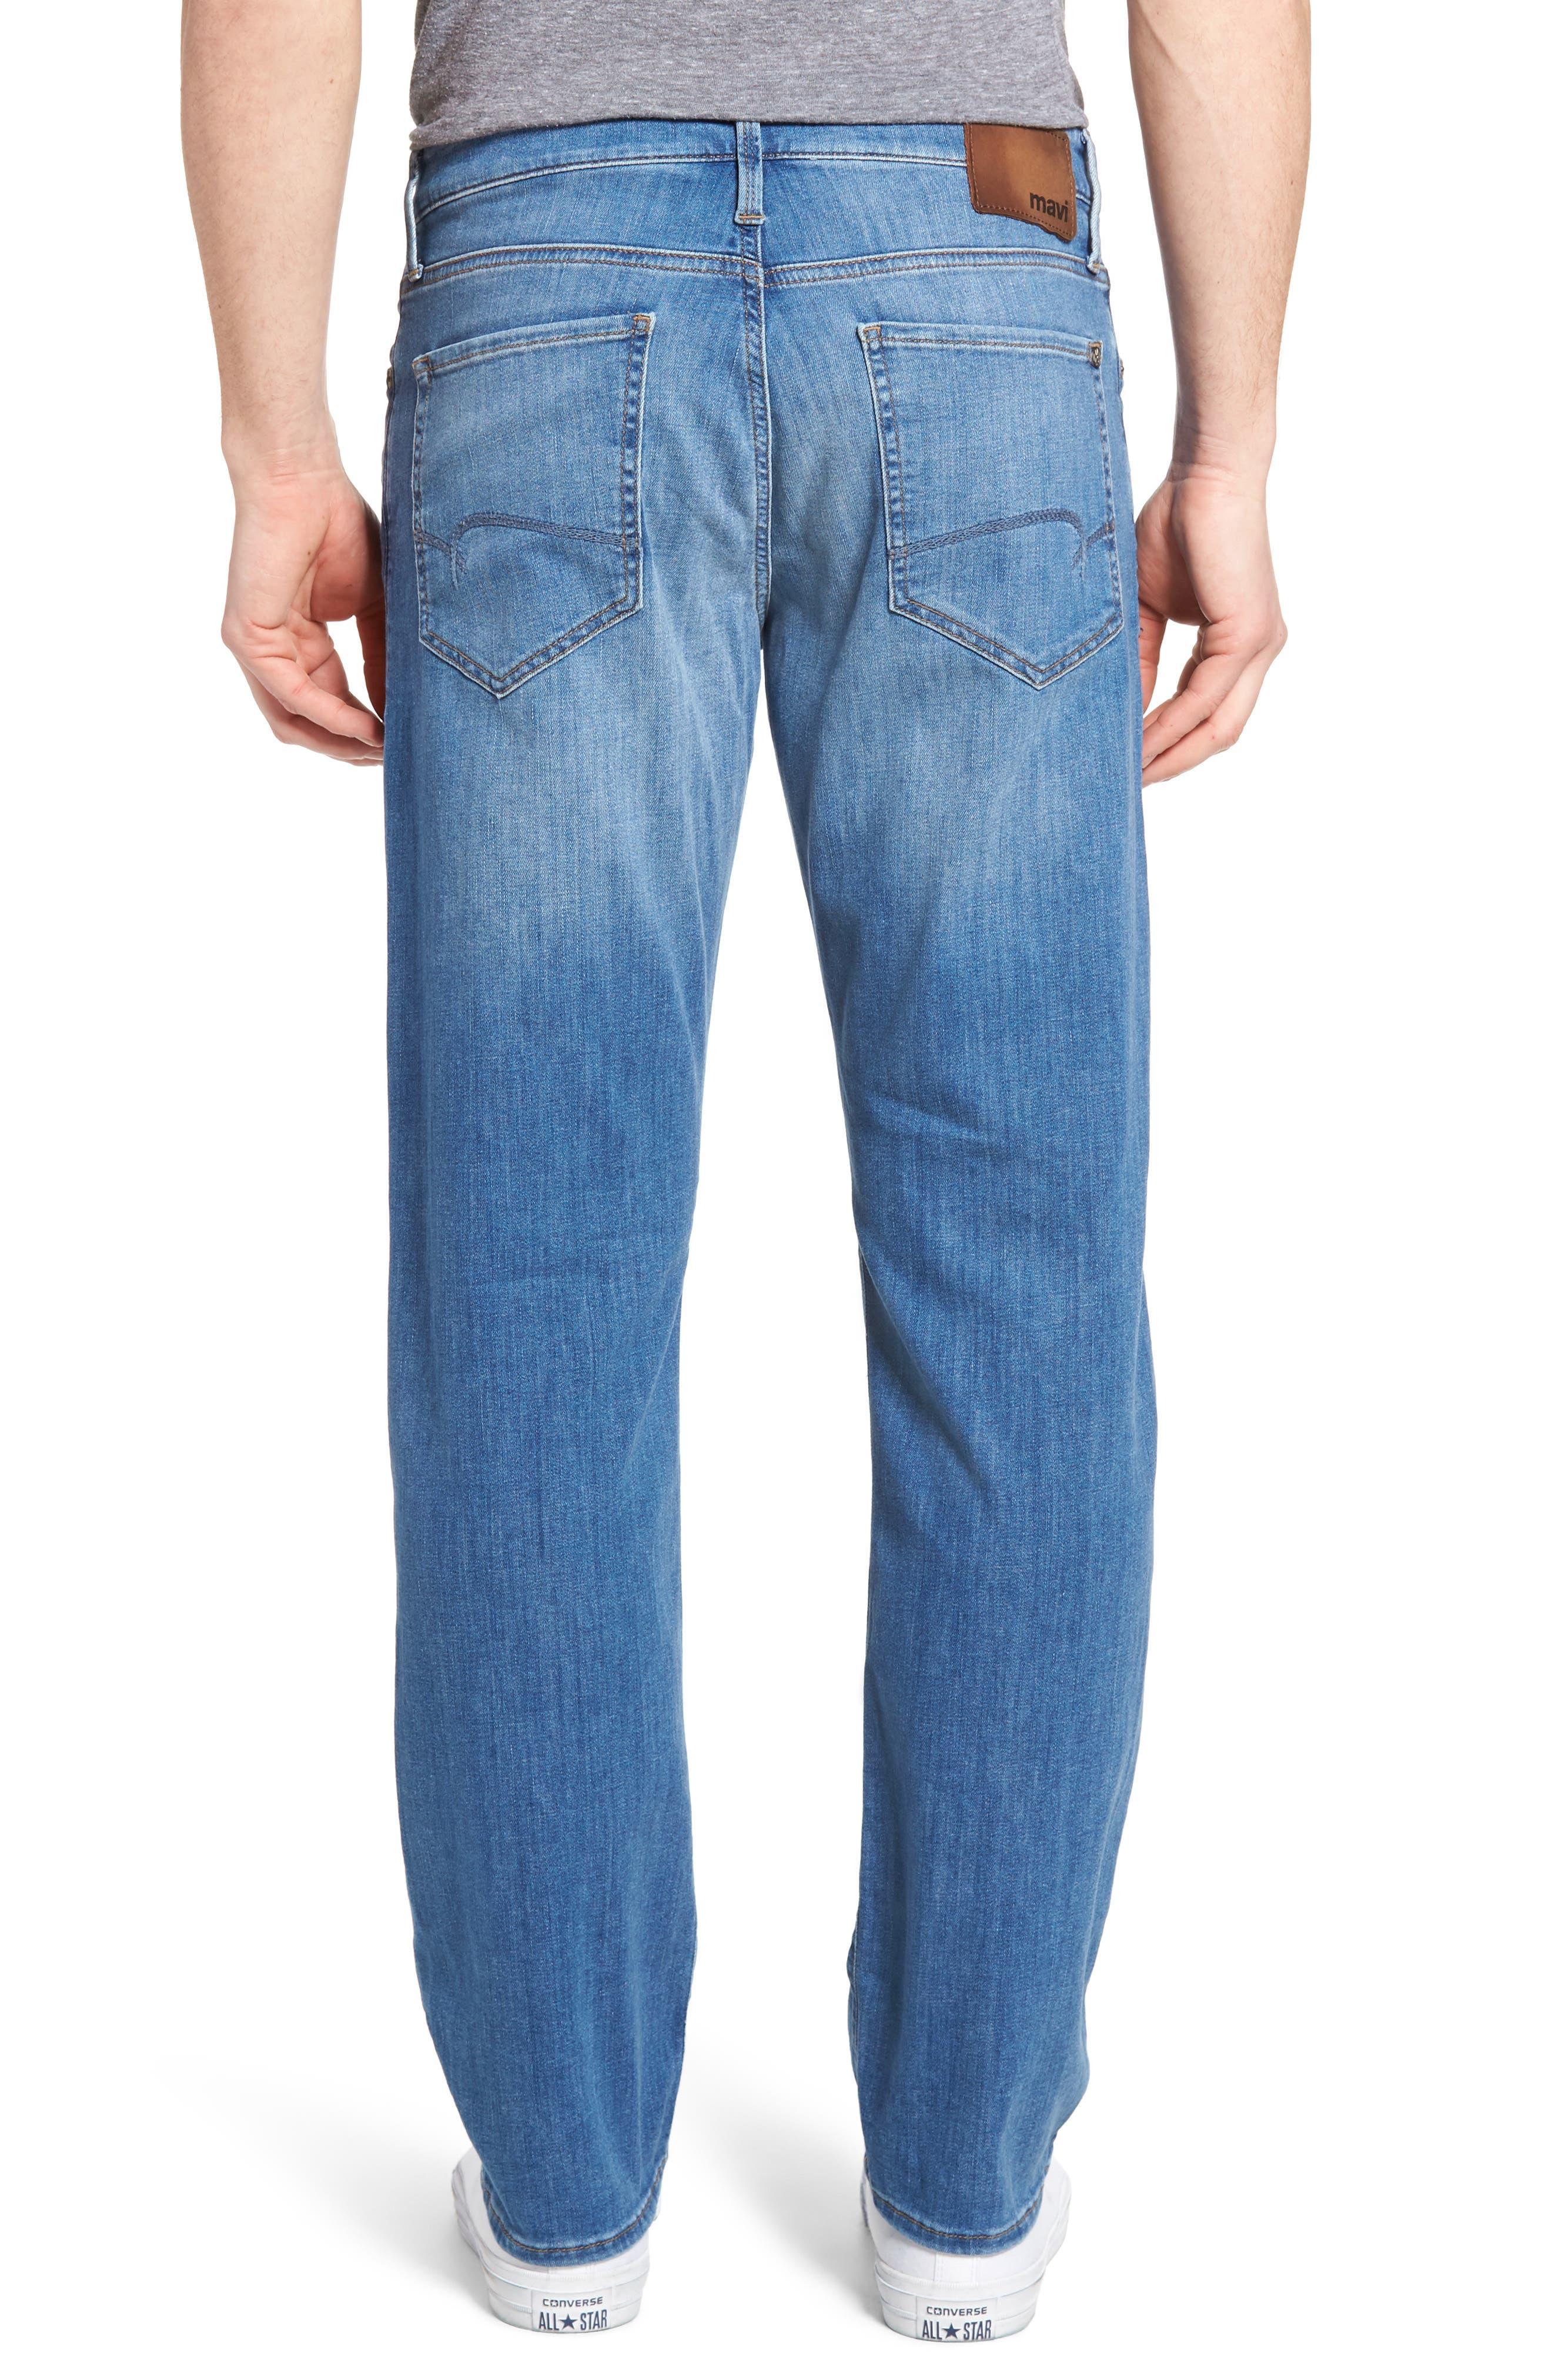 Myles Straight Leg Jeans,                             Alternate thumbnail 2, color,